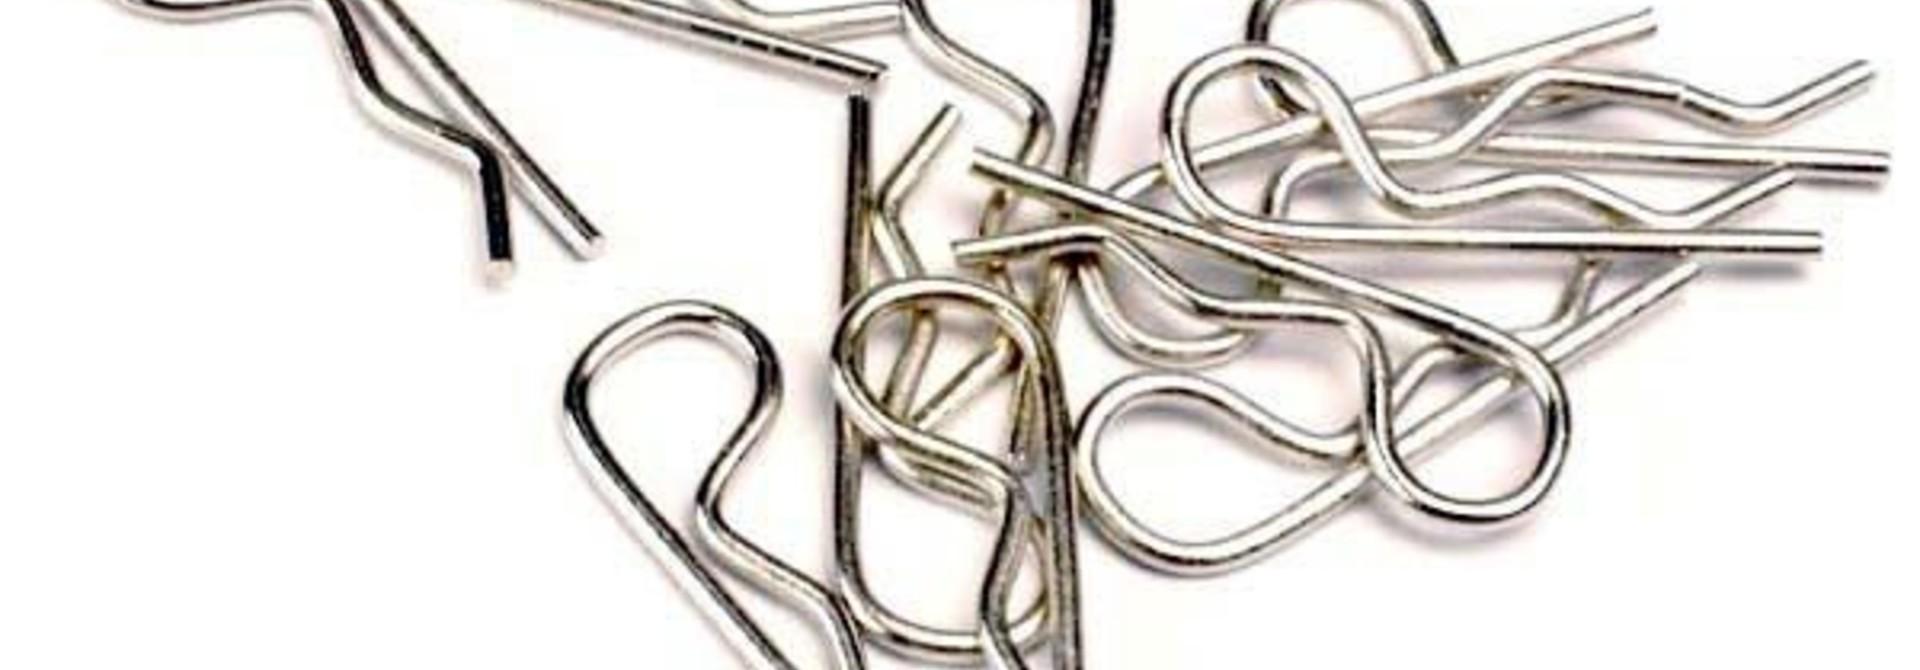 Body clips (12) (standard size), TRX1834